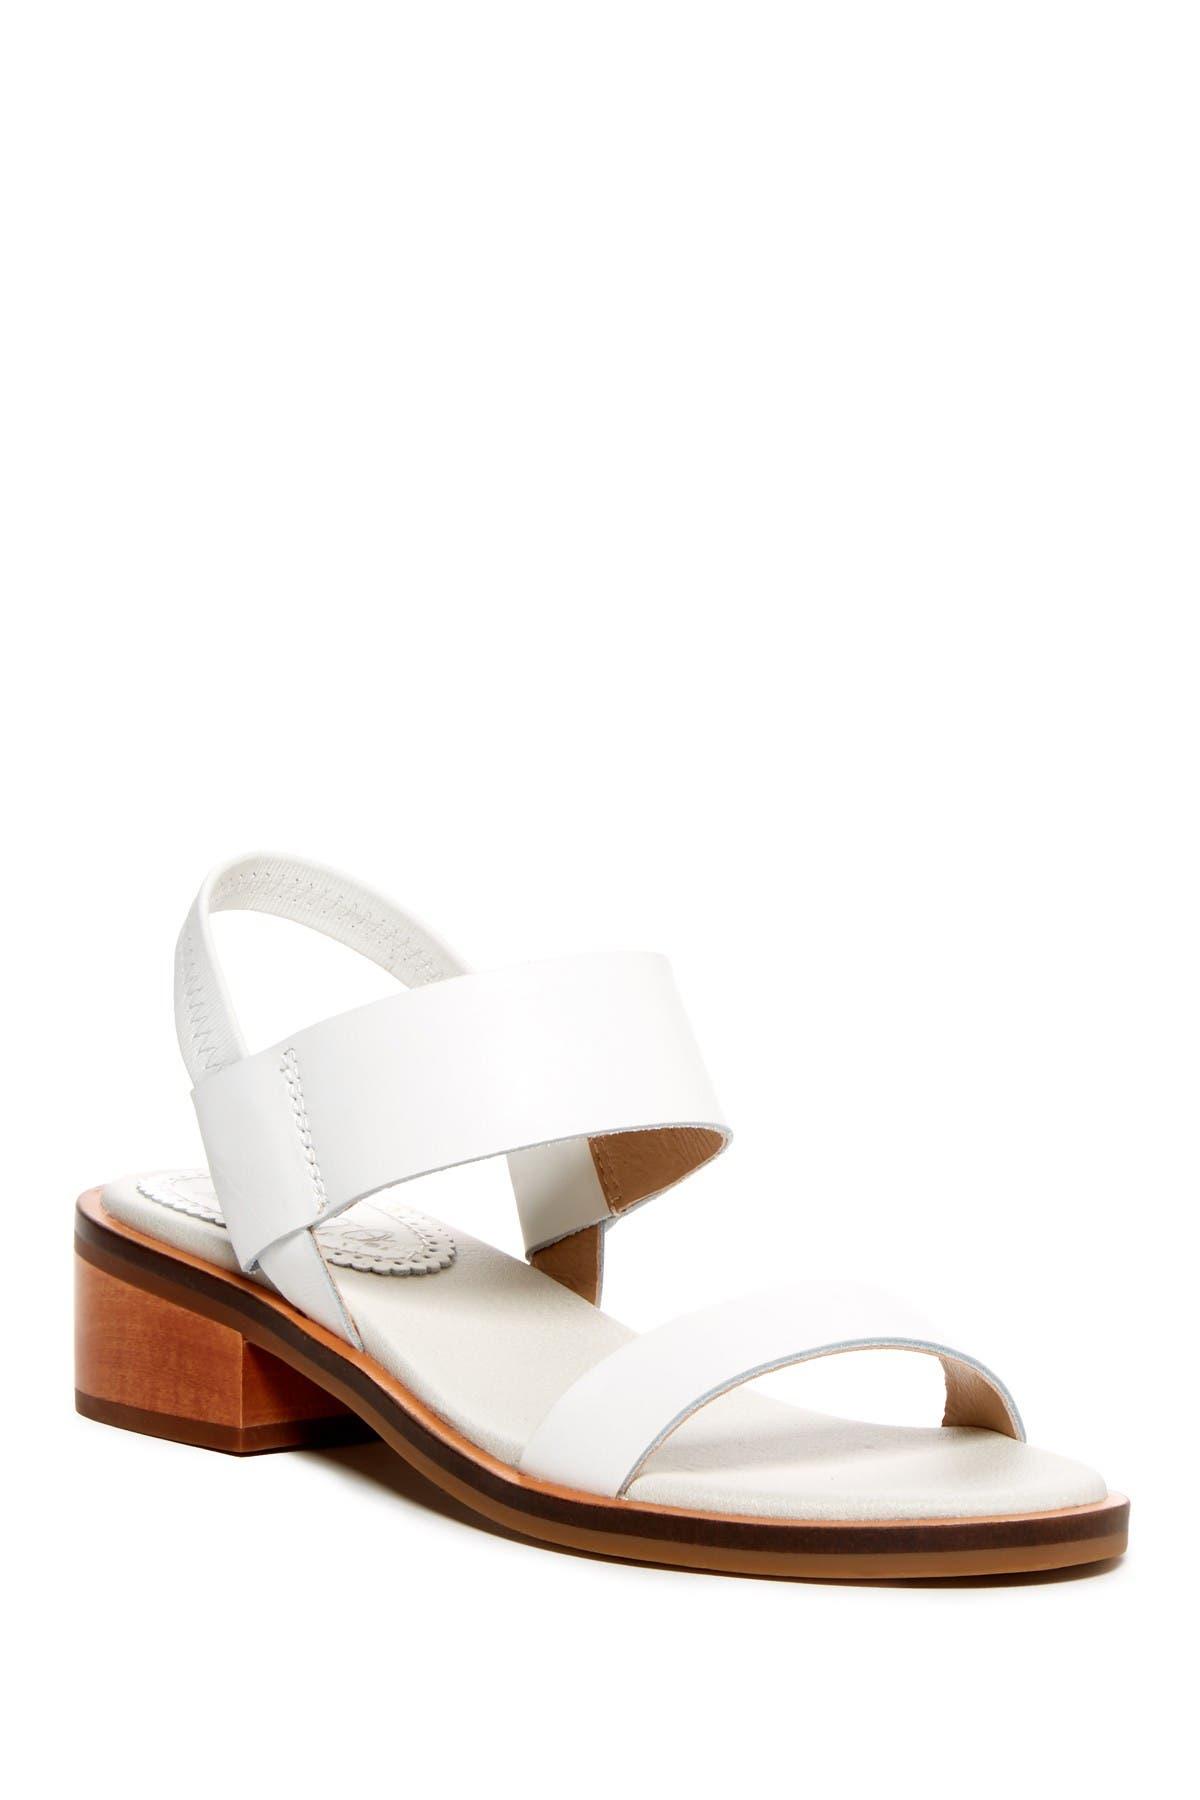 Image of Latigo Halo Slingback Sandal